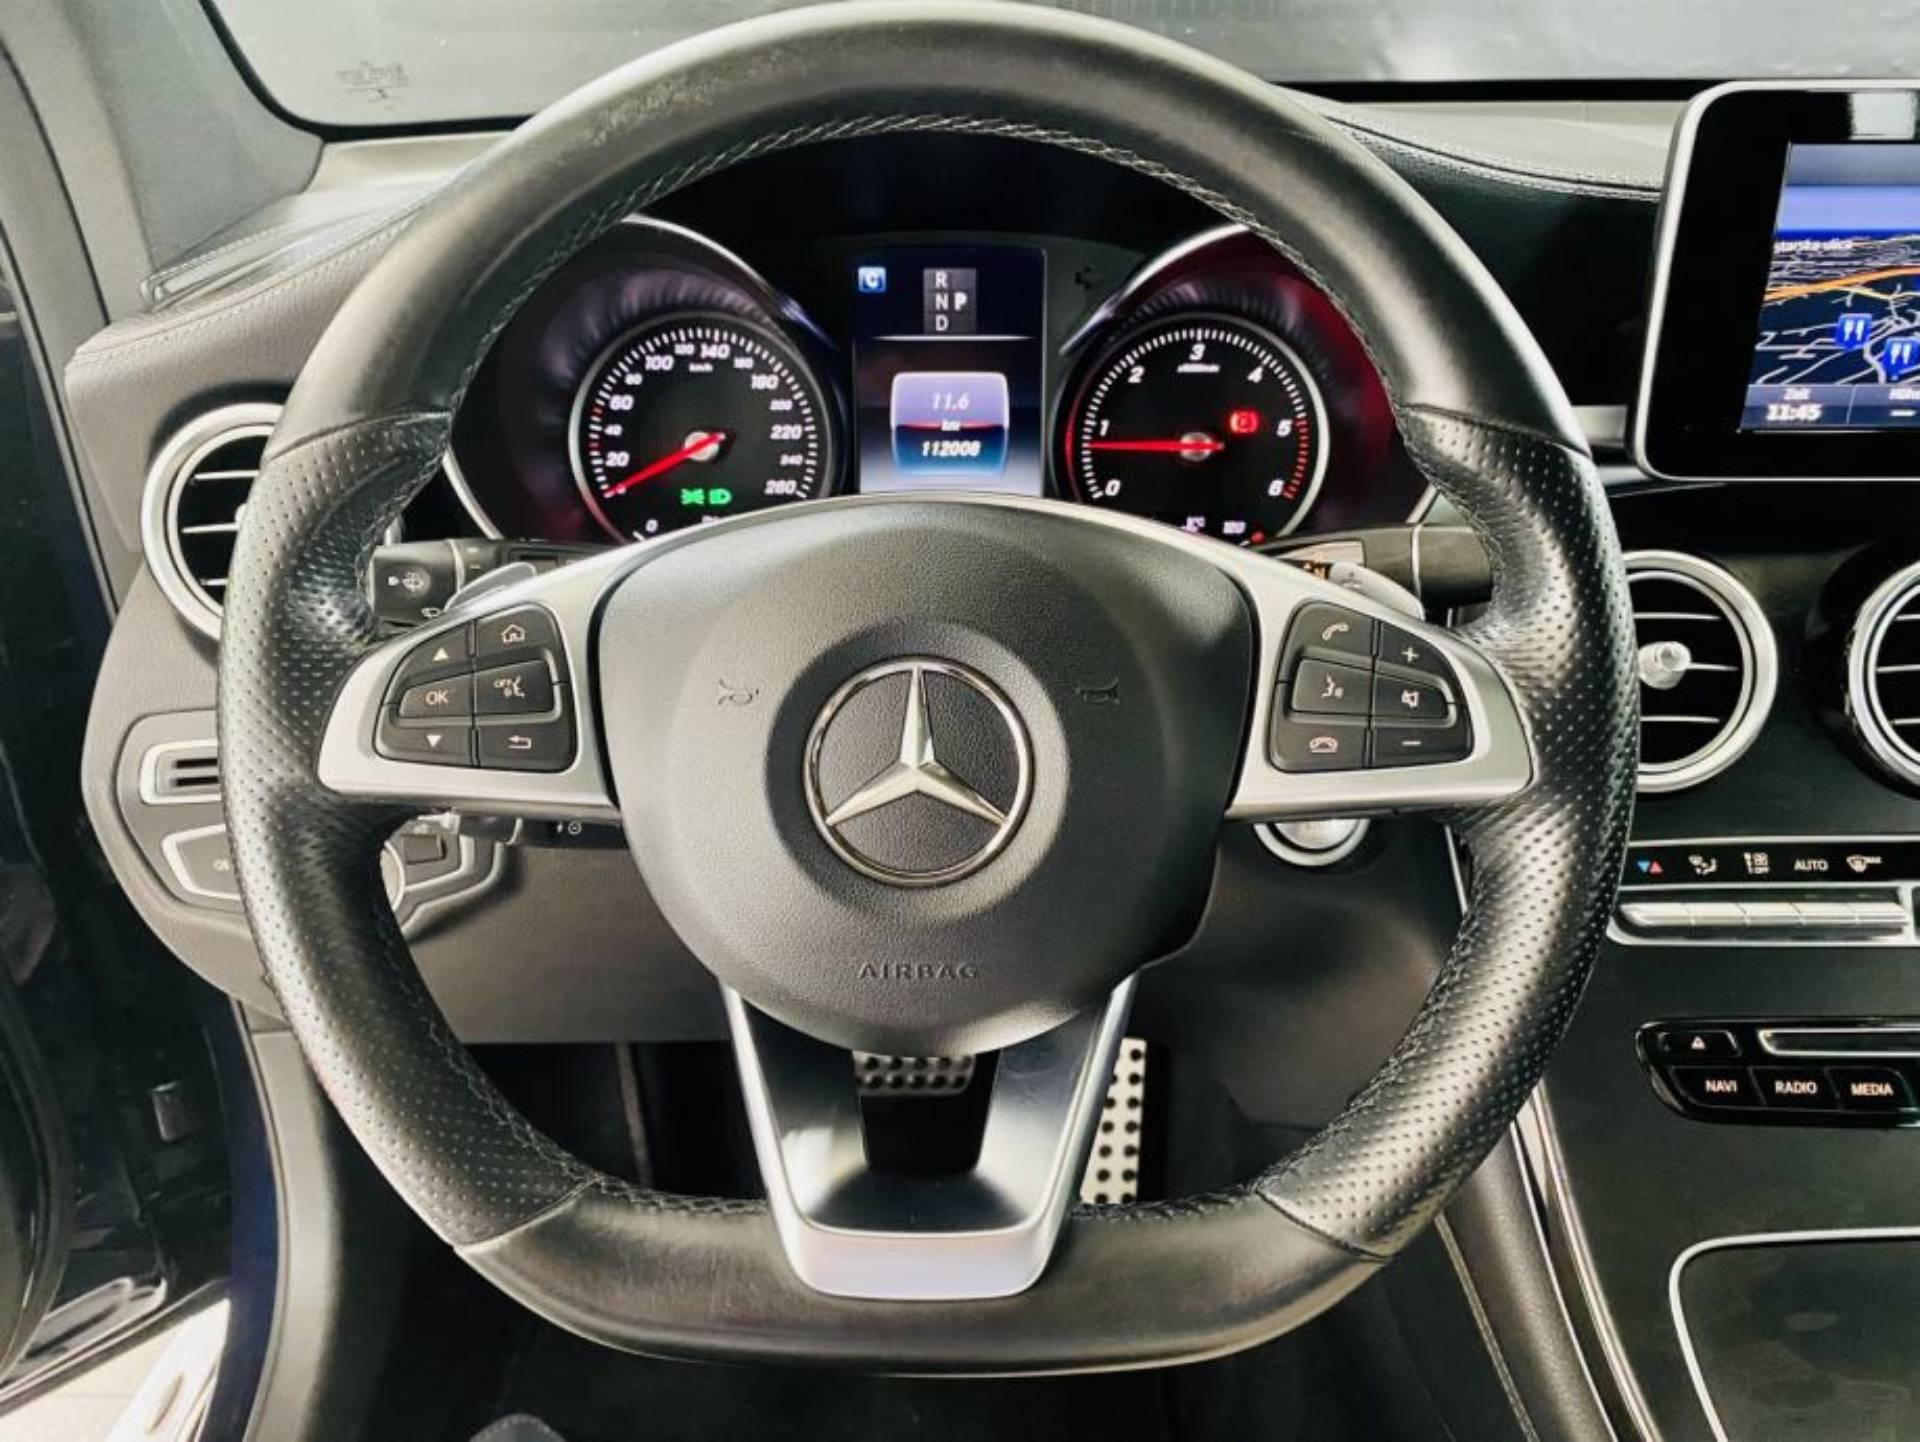 Mercedes-Benz GLC 250 d 4MATIC AMG LINE 9G